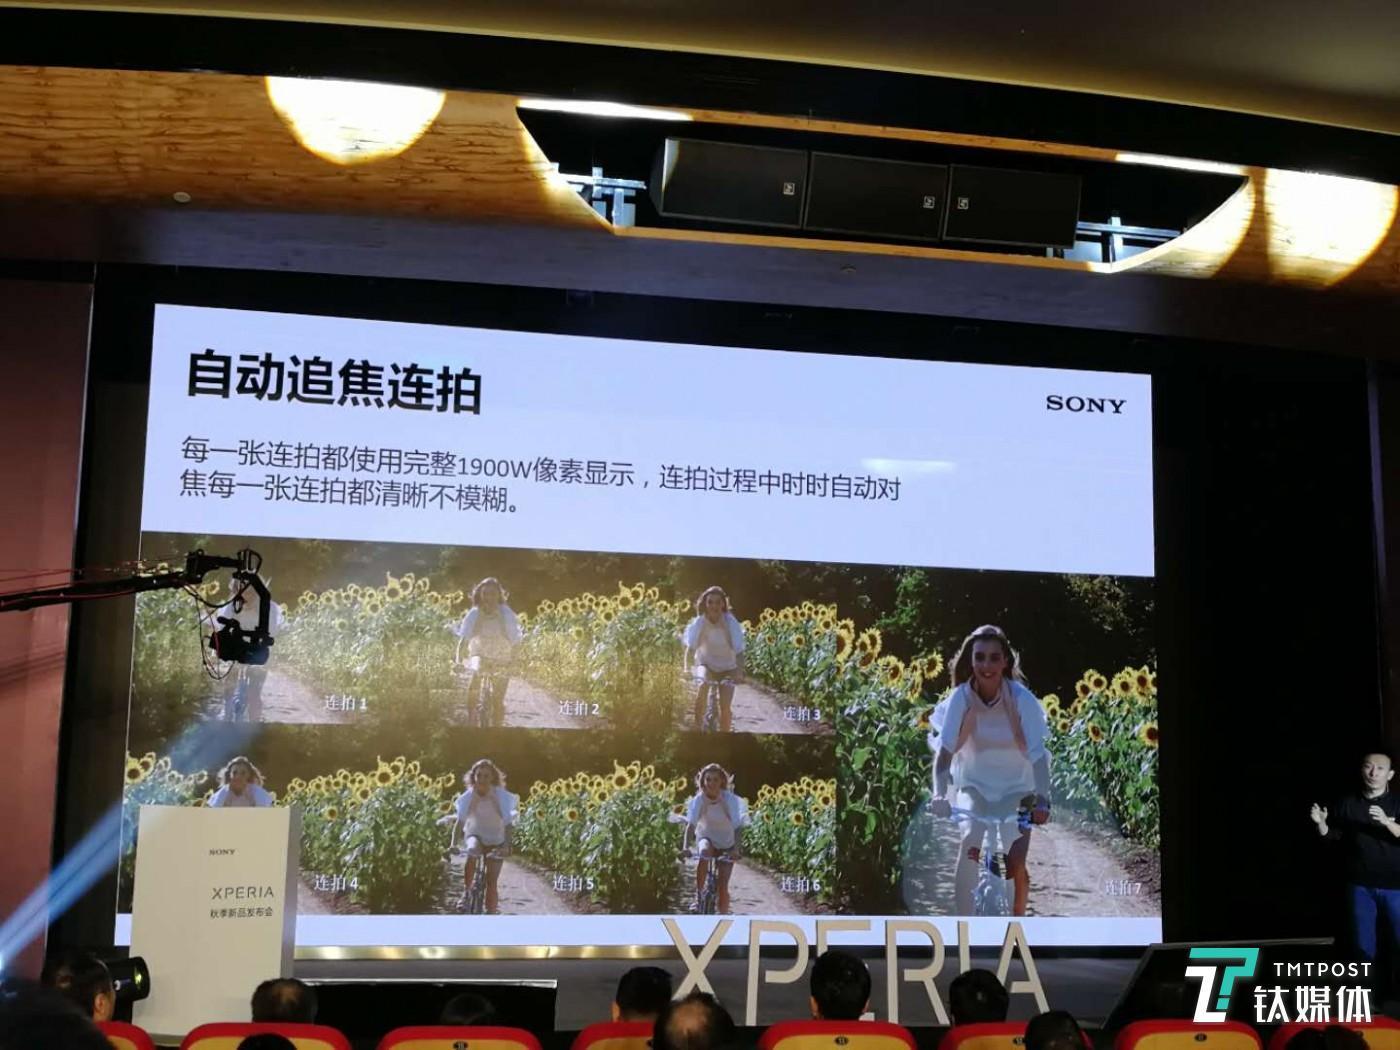 Xperia XZ1自动追焦连拍功能